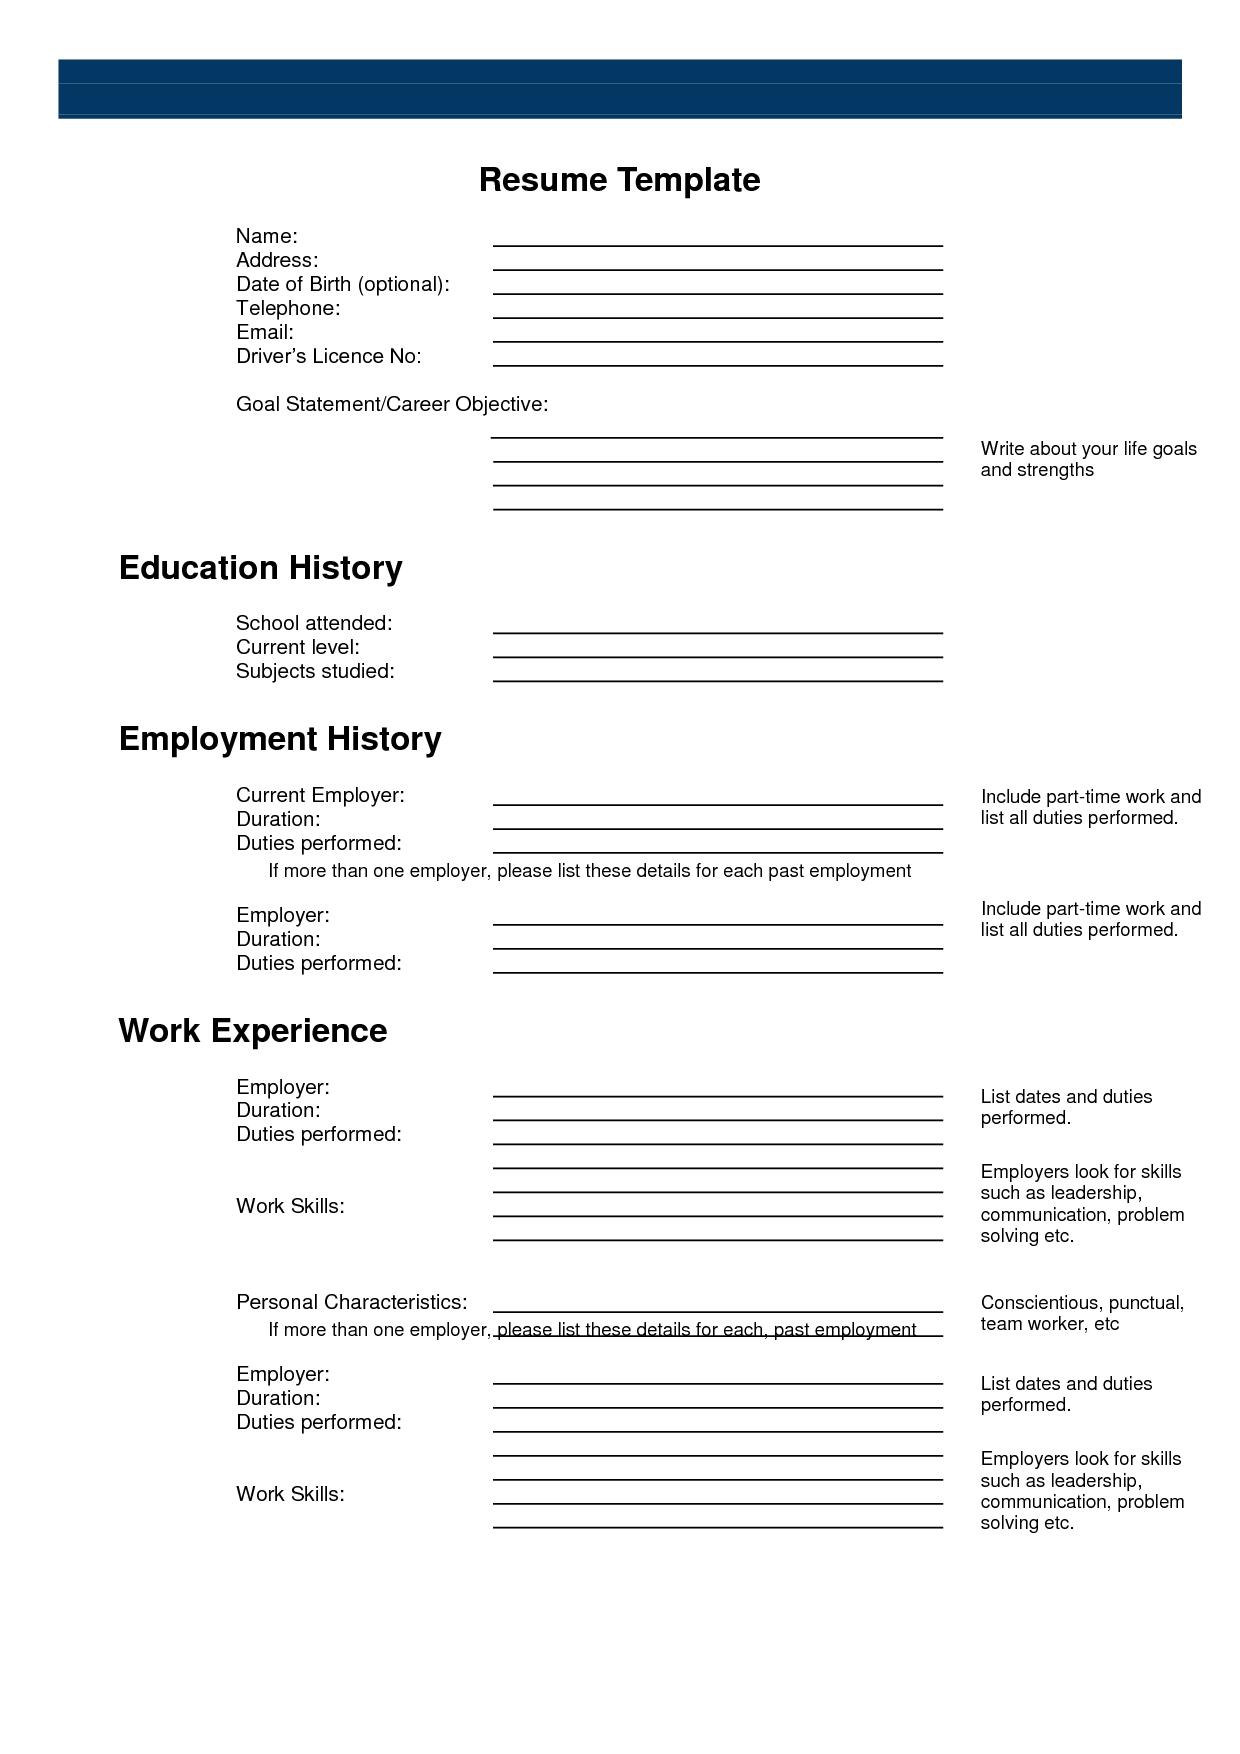 Resume Templates Online Free Printable - Free Resume Creator Online - Free Printable Resume Builder